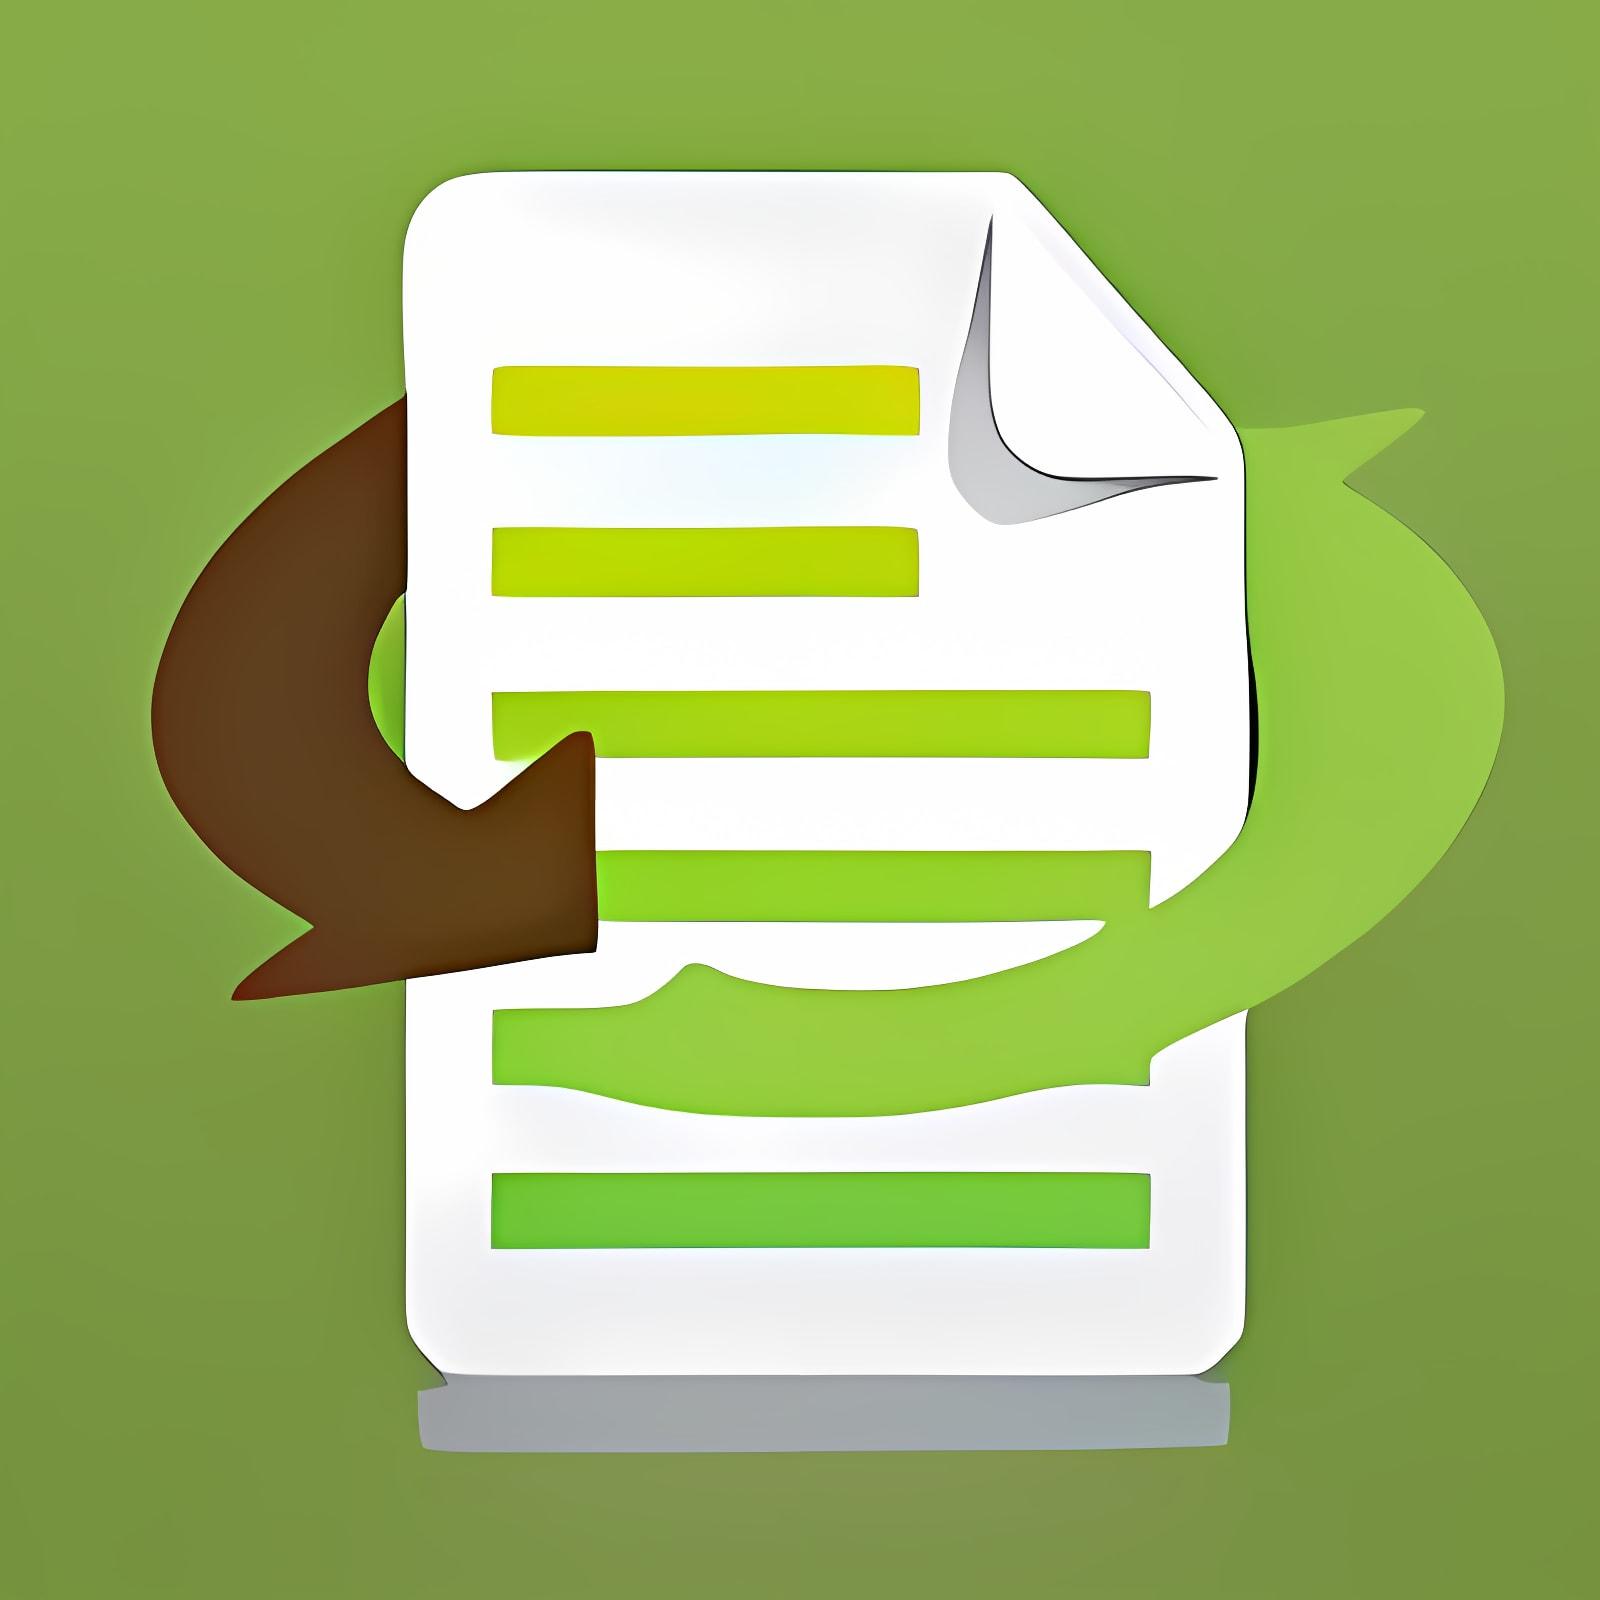 NoteSync 1.2.1